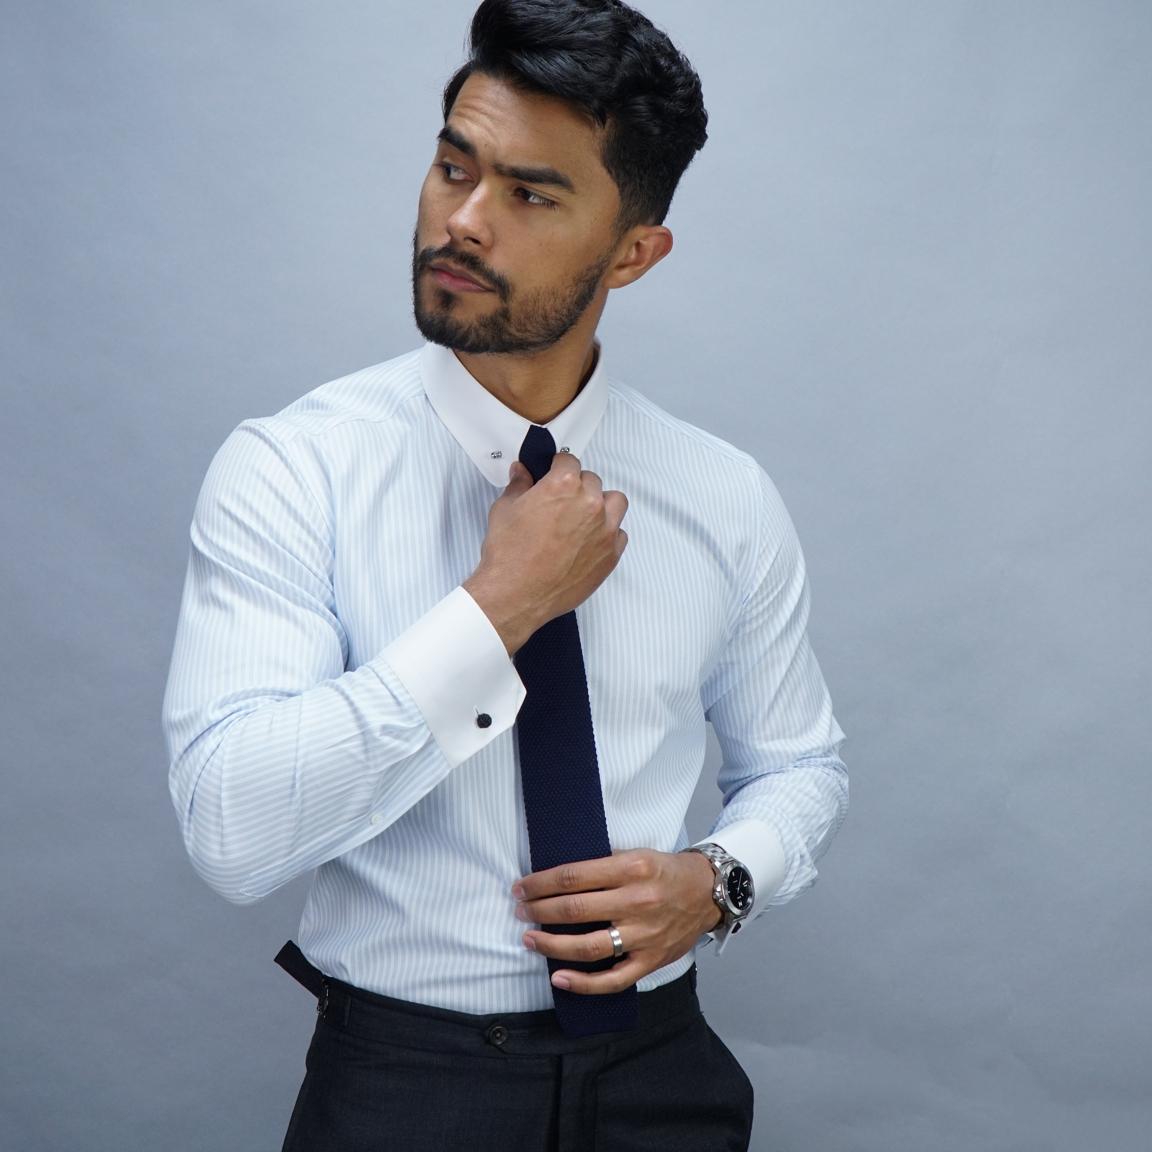 TMF - Business dress shirt in luxurious white and blue herringbone